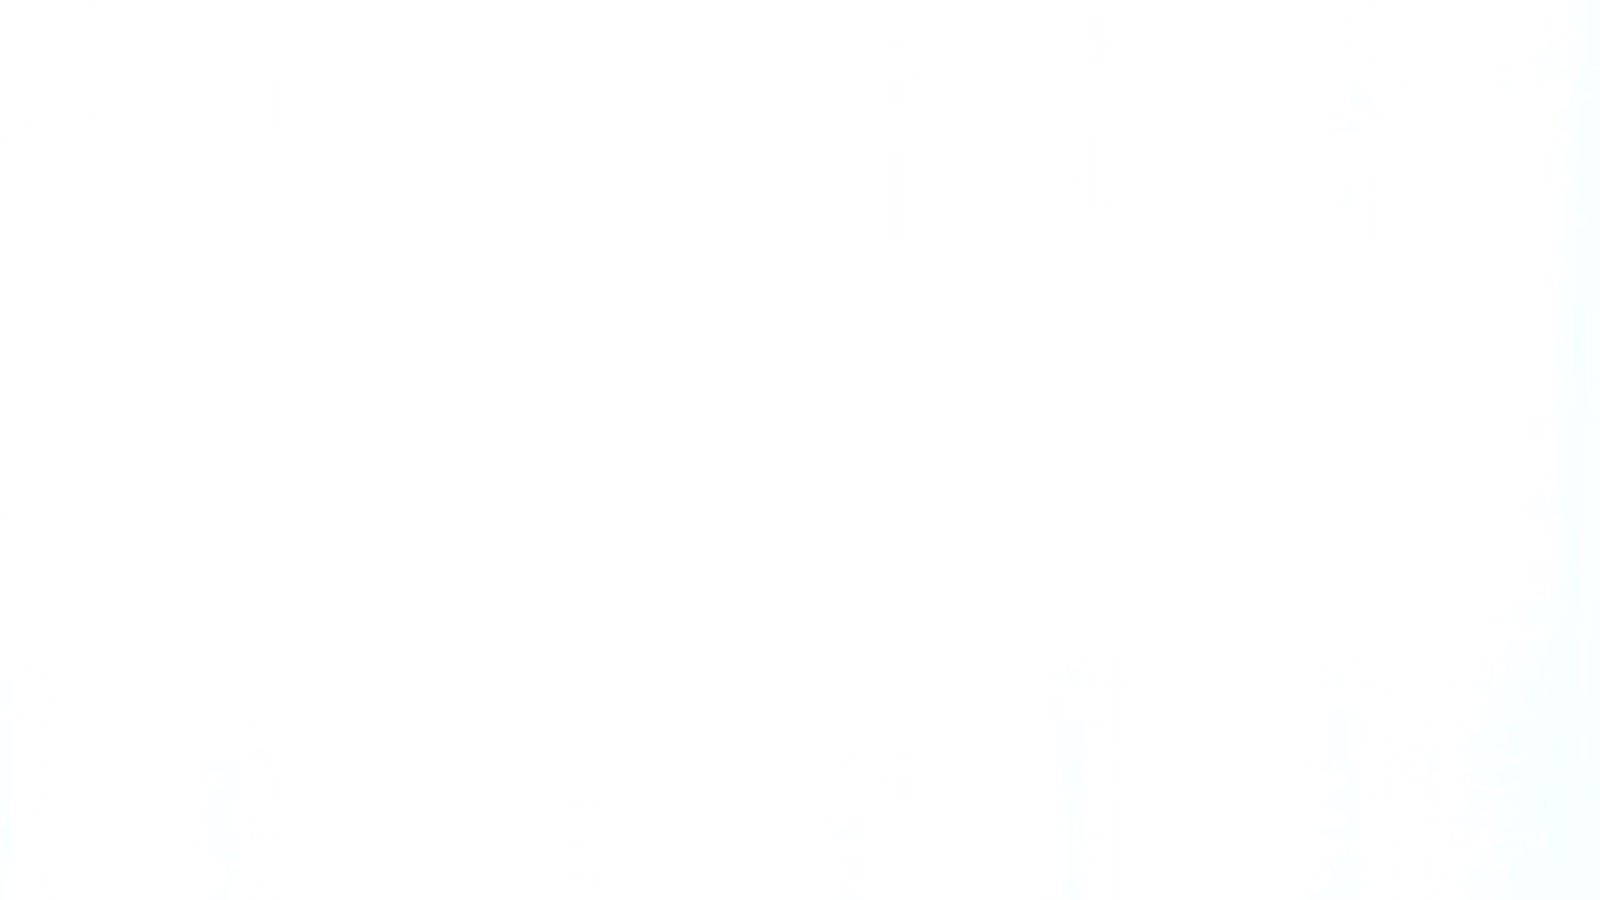 UraLesbian-Vol.068.YuiKasugano-MaiMiori-068-1080p.mp4.1 UraLesbian Vol.068.YuiKasugano-MaiMiori-068-1080p.mp4